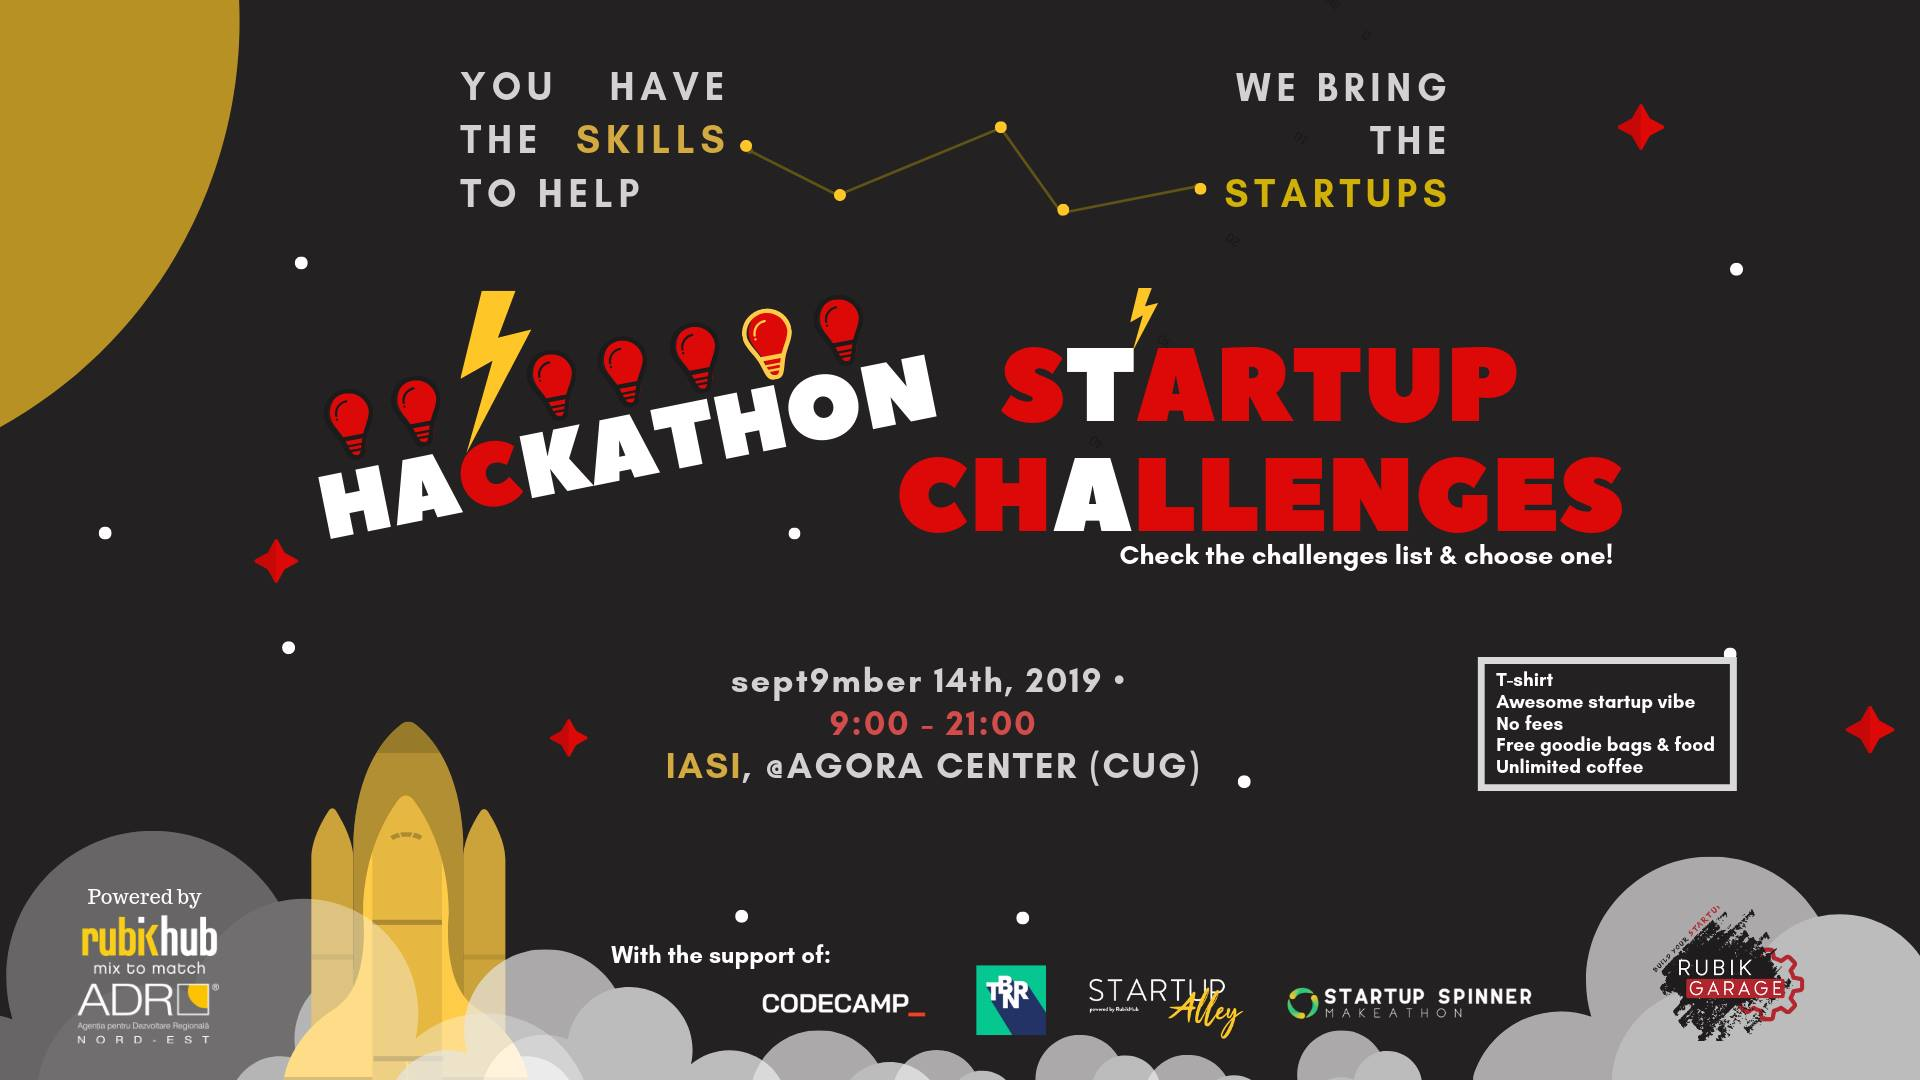 Statup Challenges Hackathon